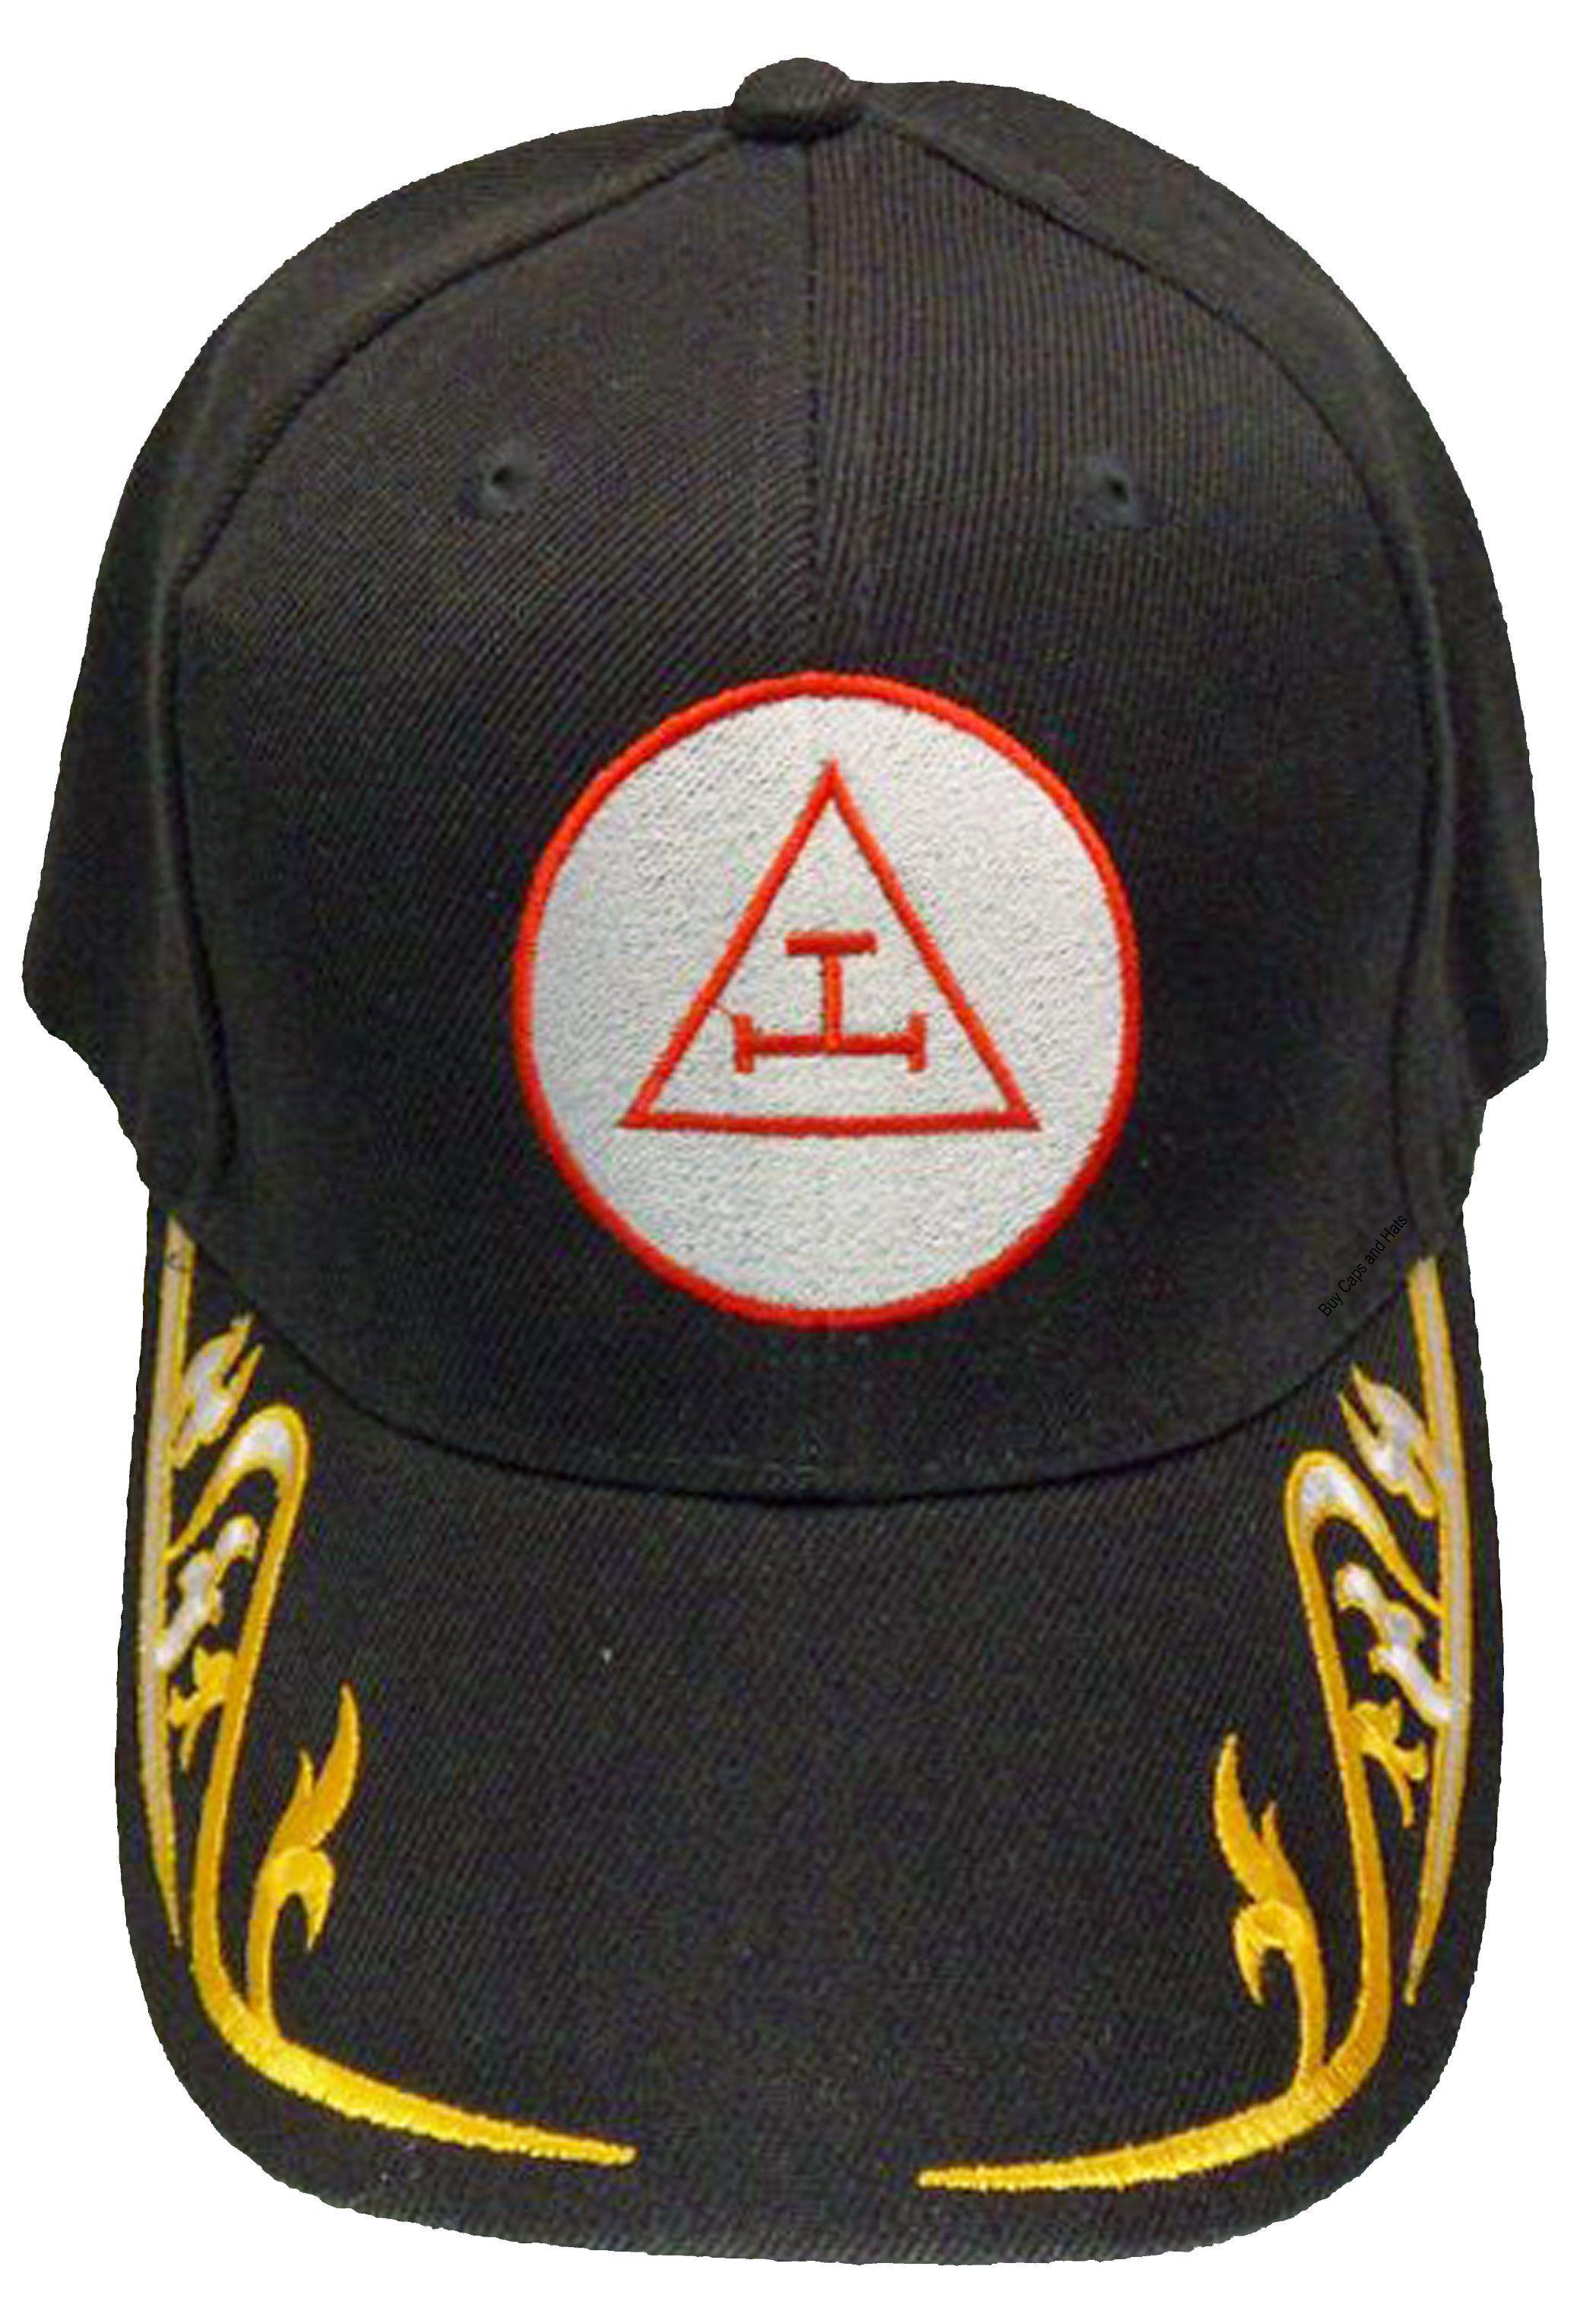 9778b130 ROYAL ARCH Mason Cap Masons Black Hat Masonic Baseball Cap   Masonic ...